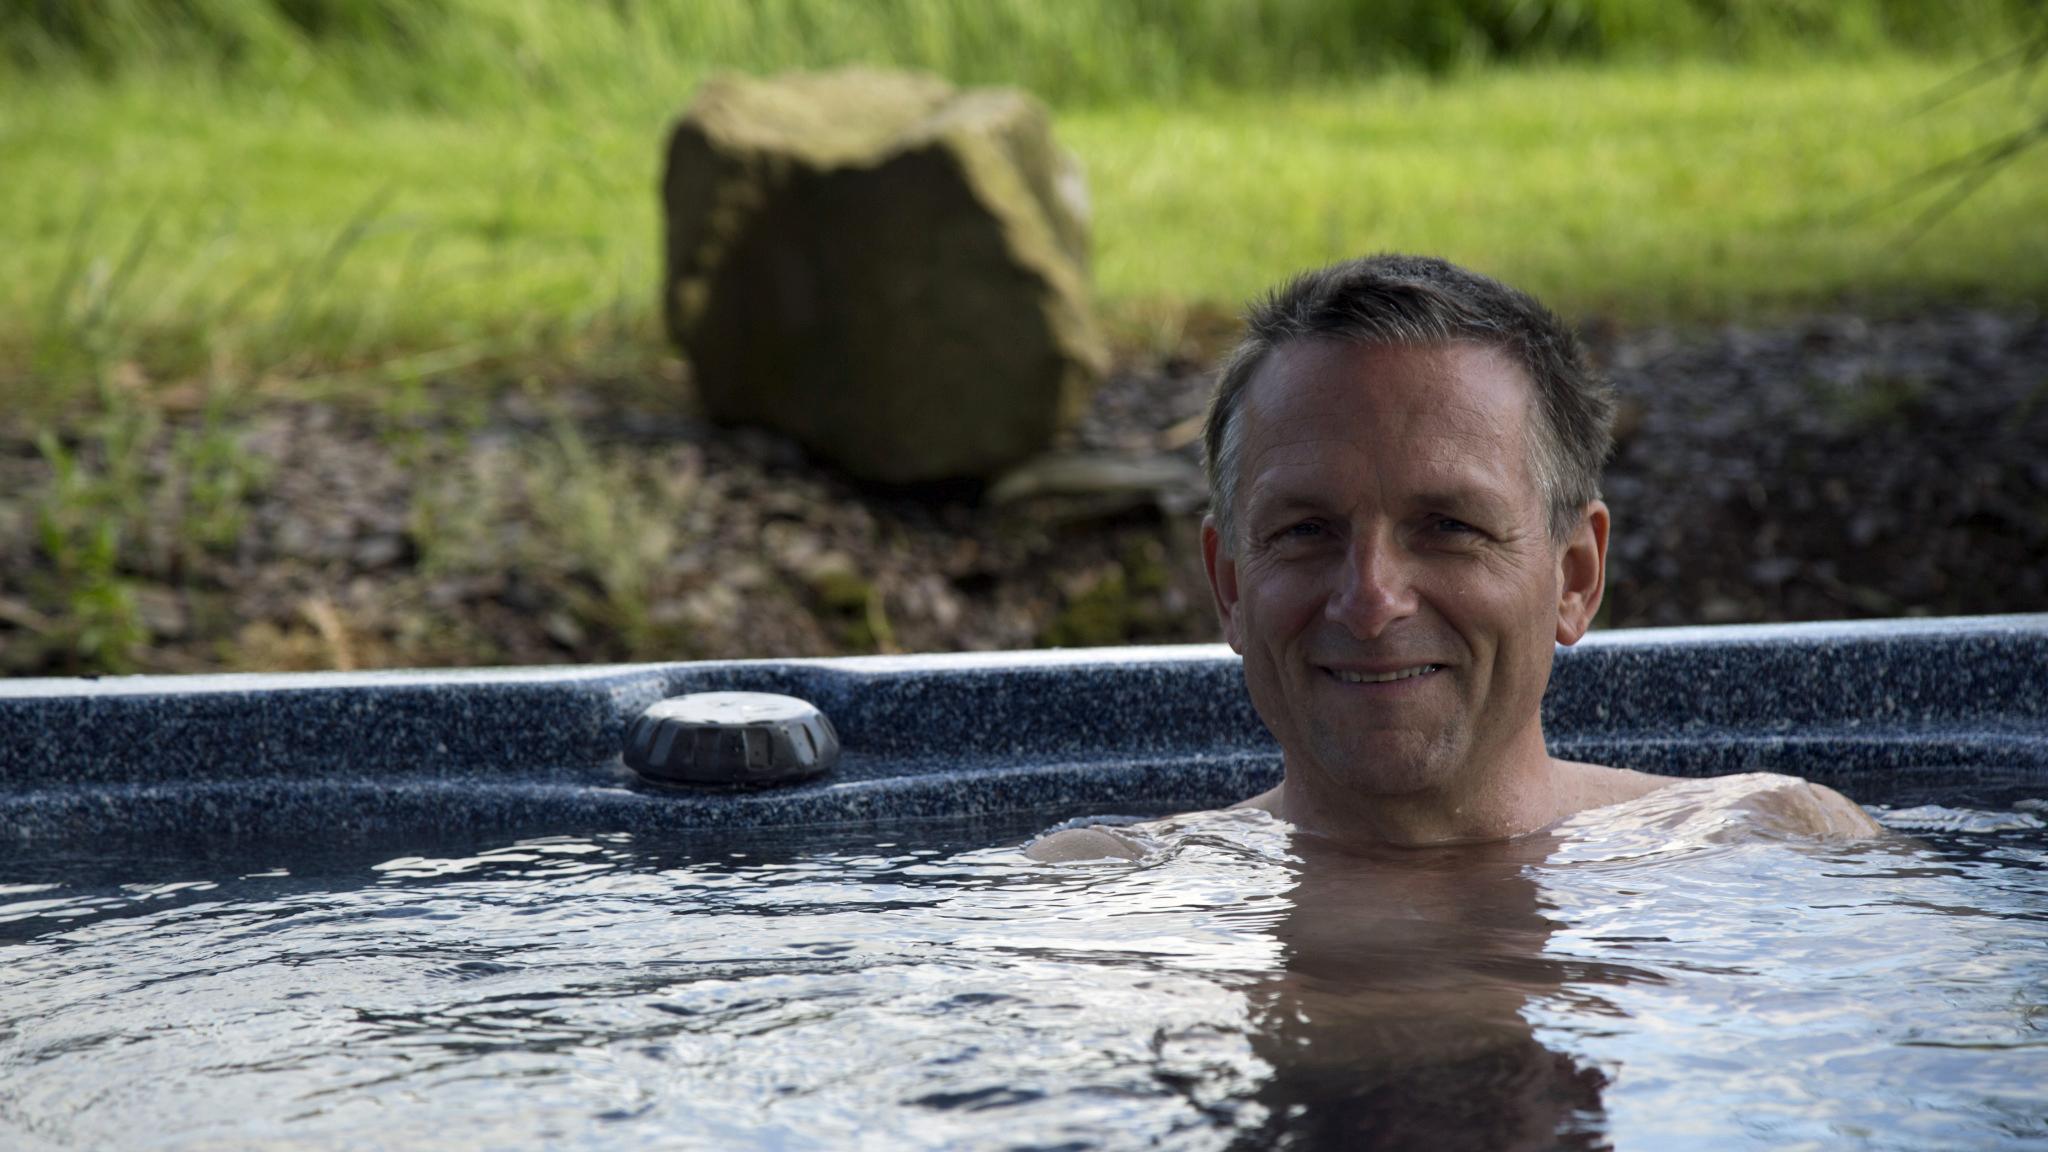 Michael Mosley in a hot bath